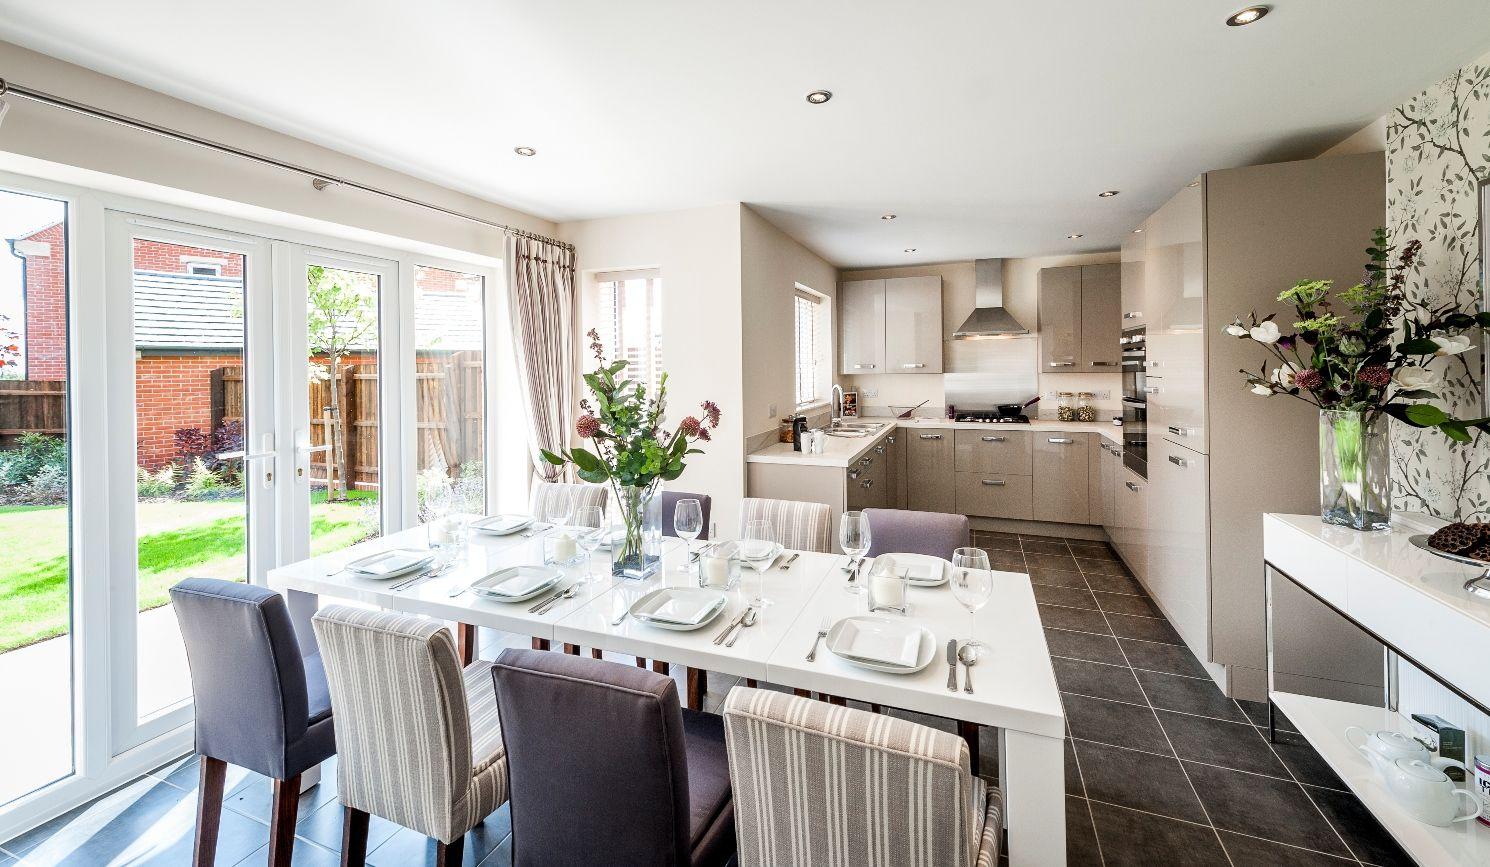 Kitchen Diner Design Layouts - Google Search